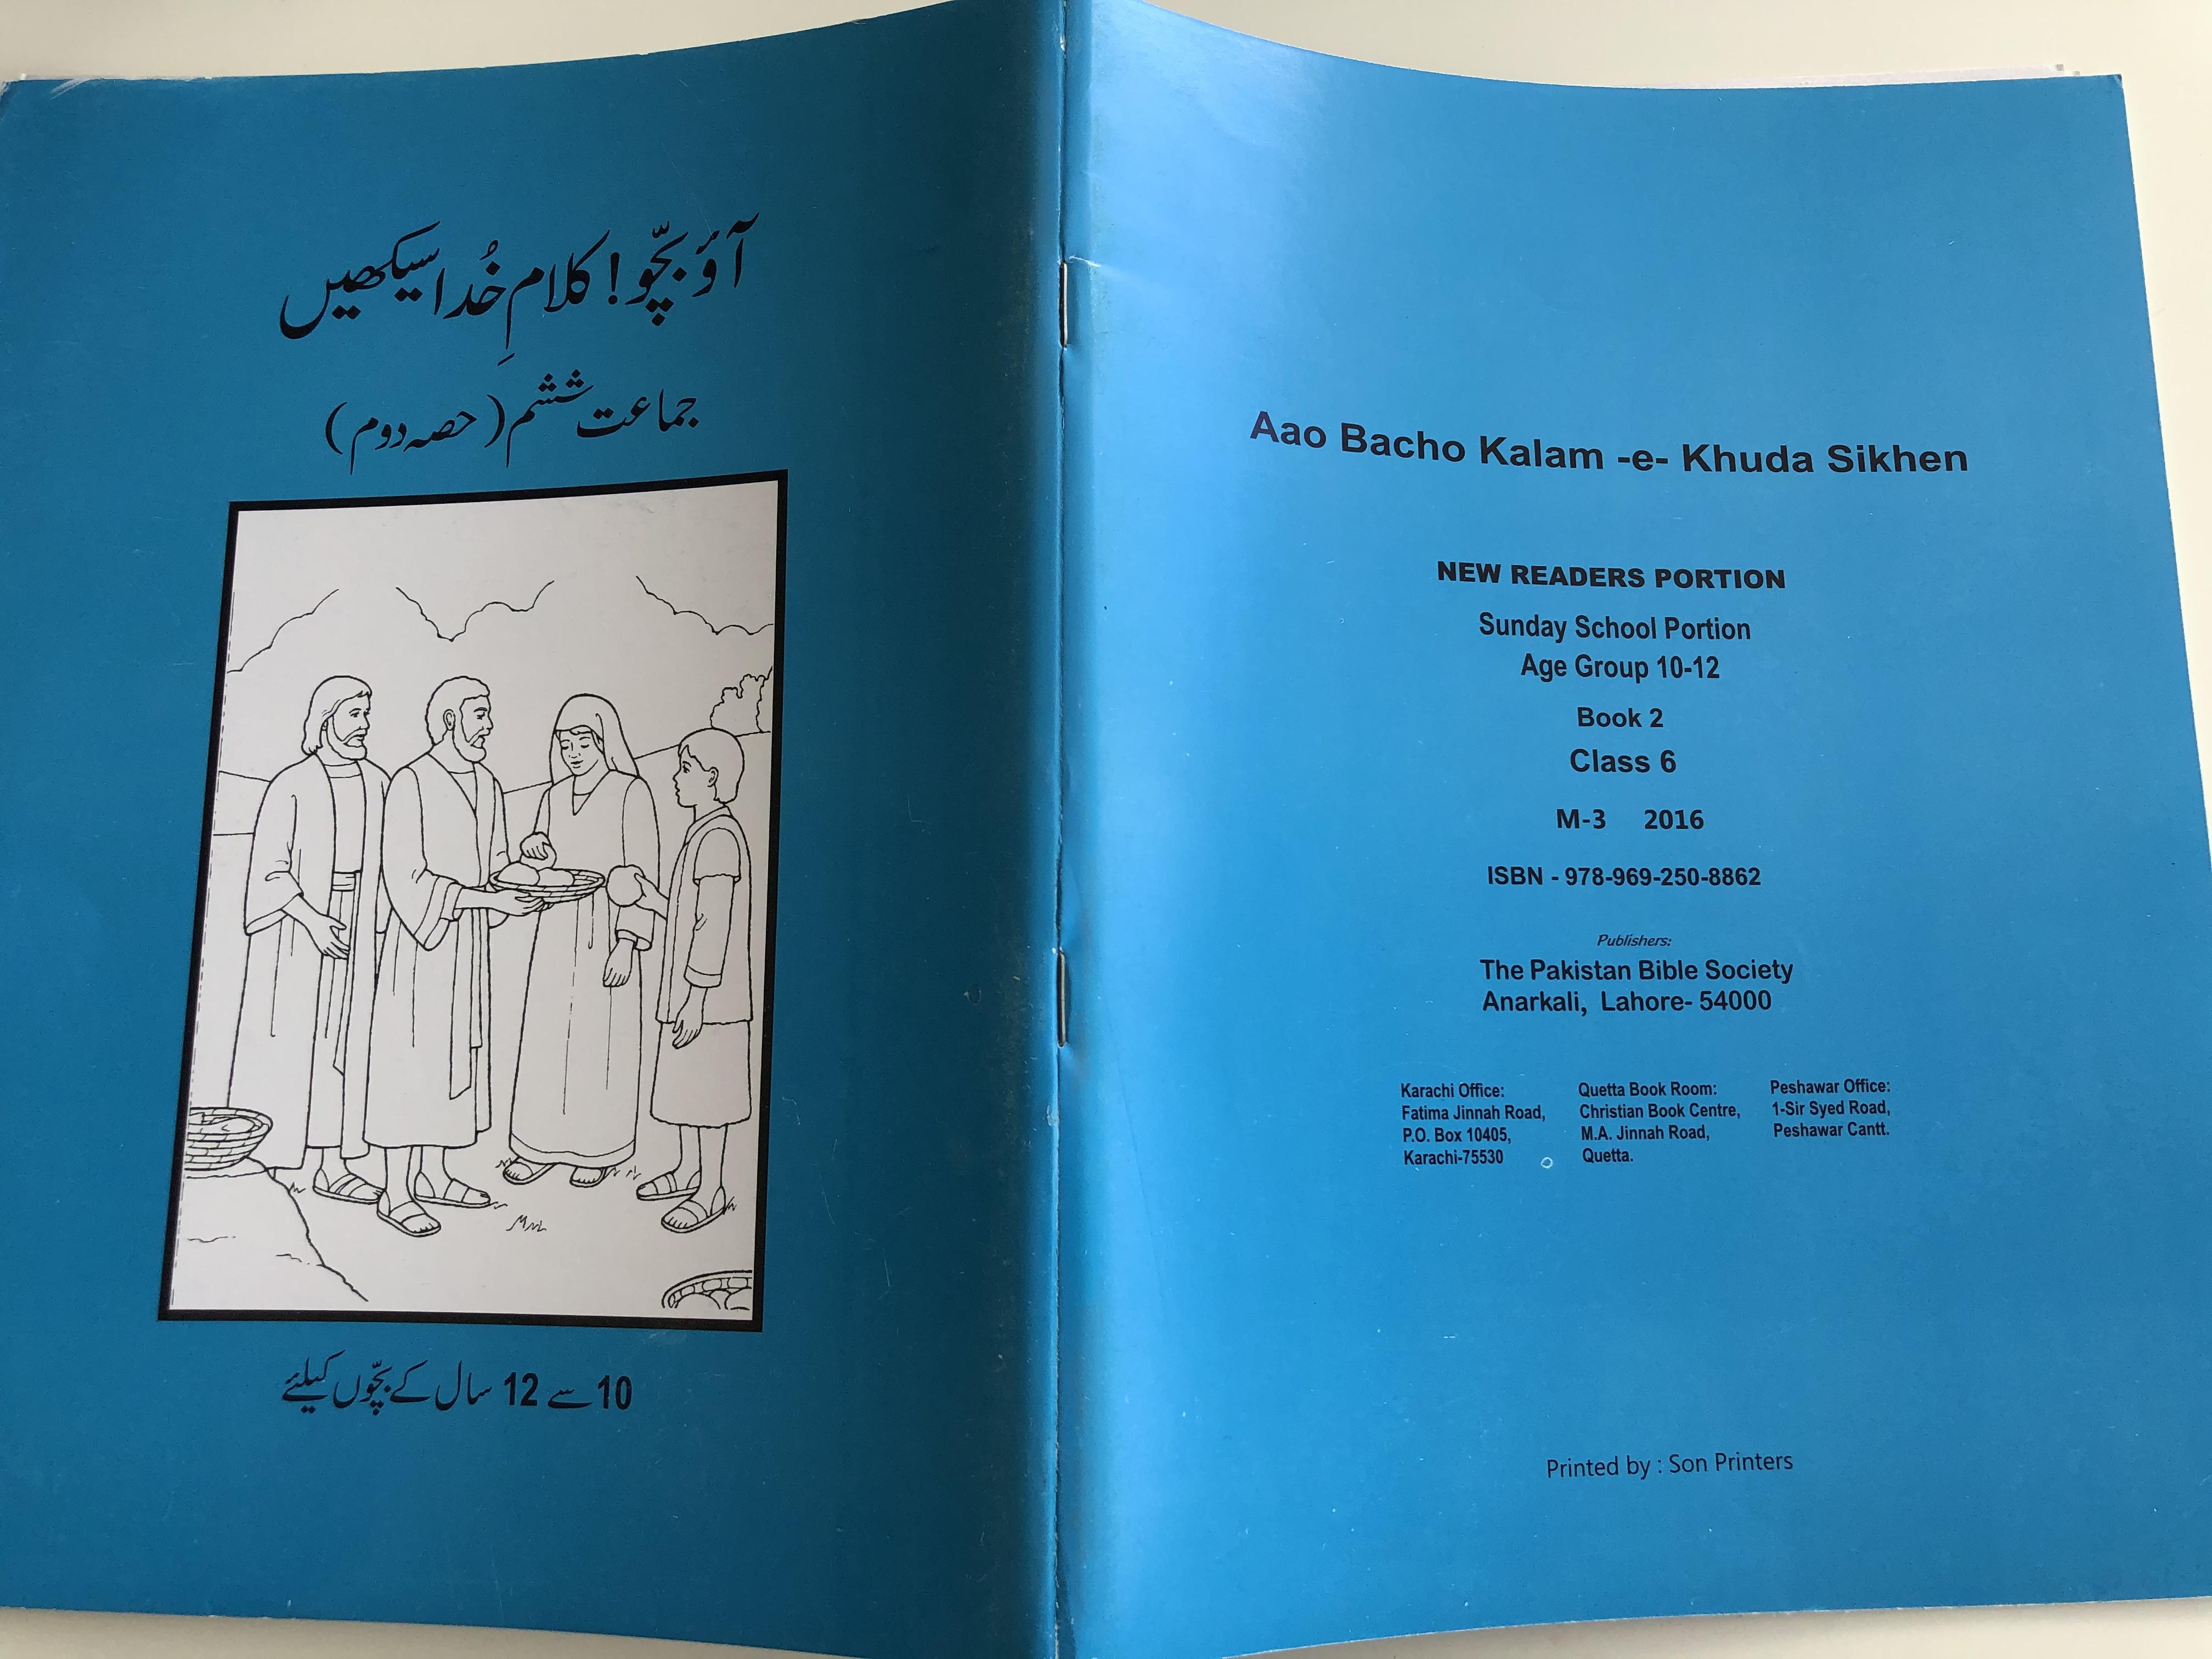 urdu-sunday-school-reading-book-2-class-6-new-readers-portion-13.jpg